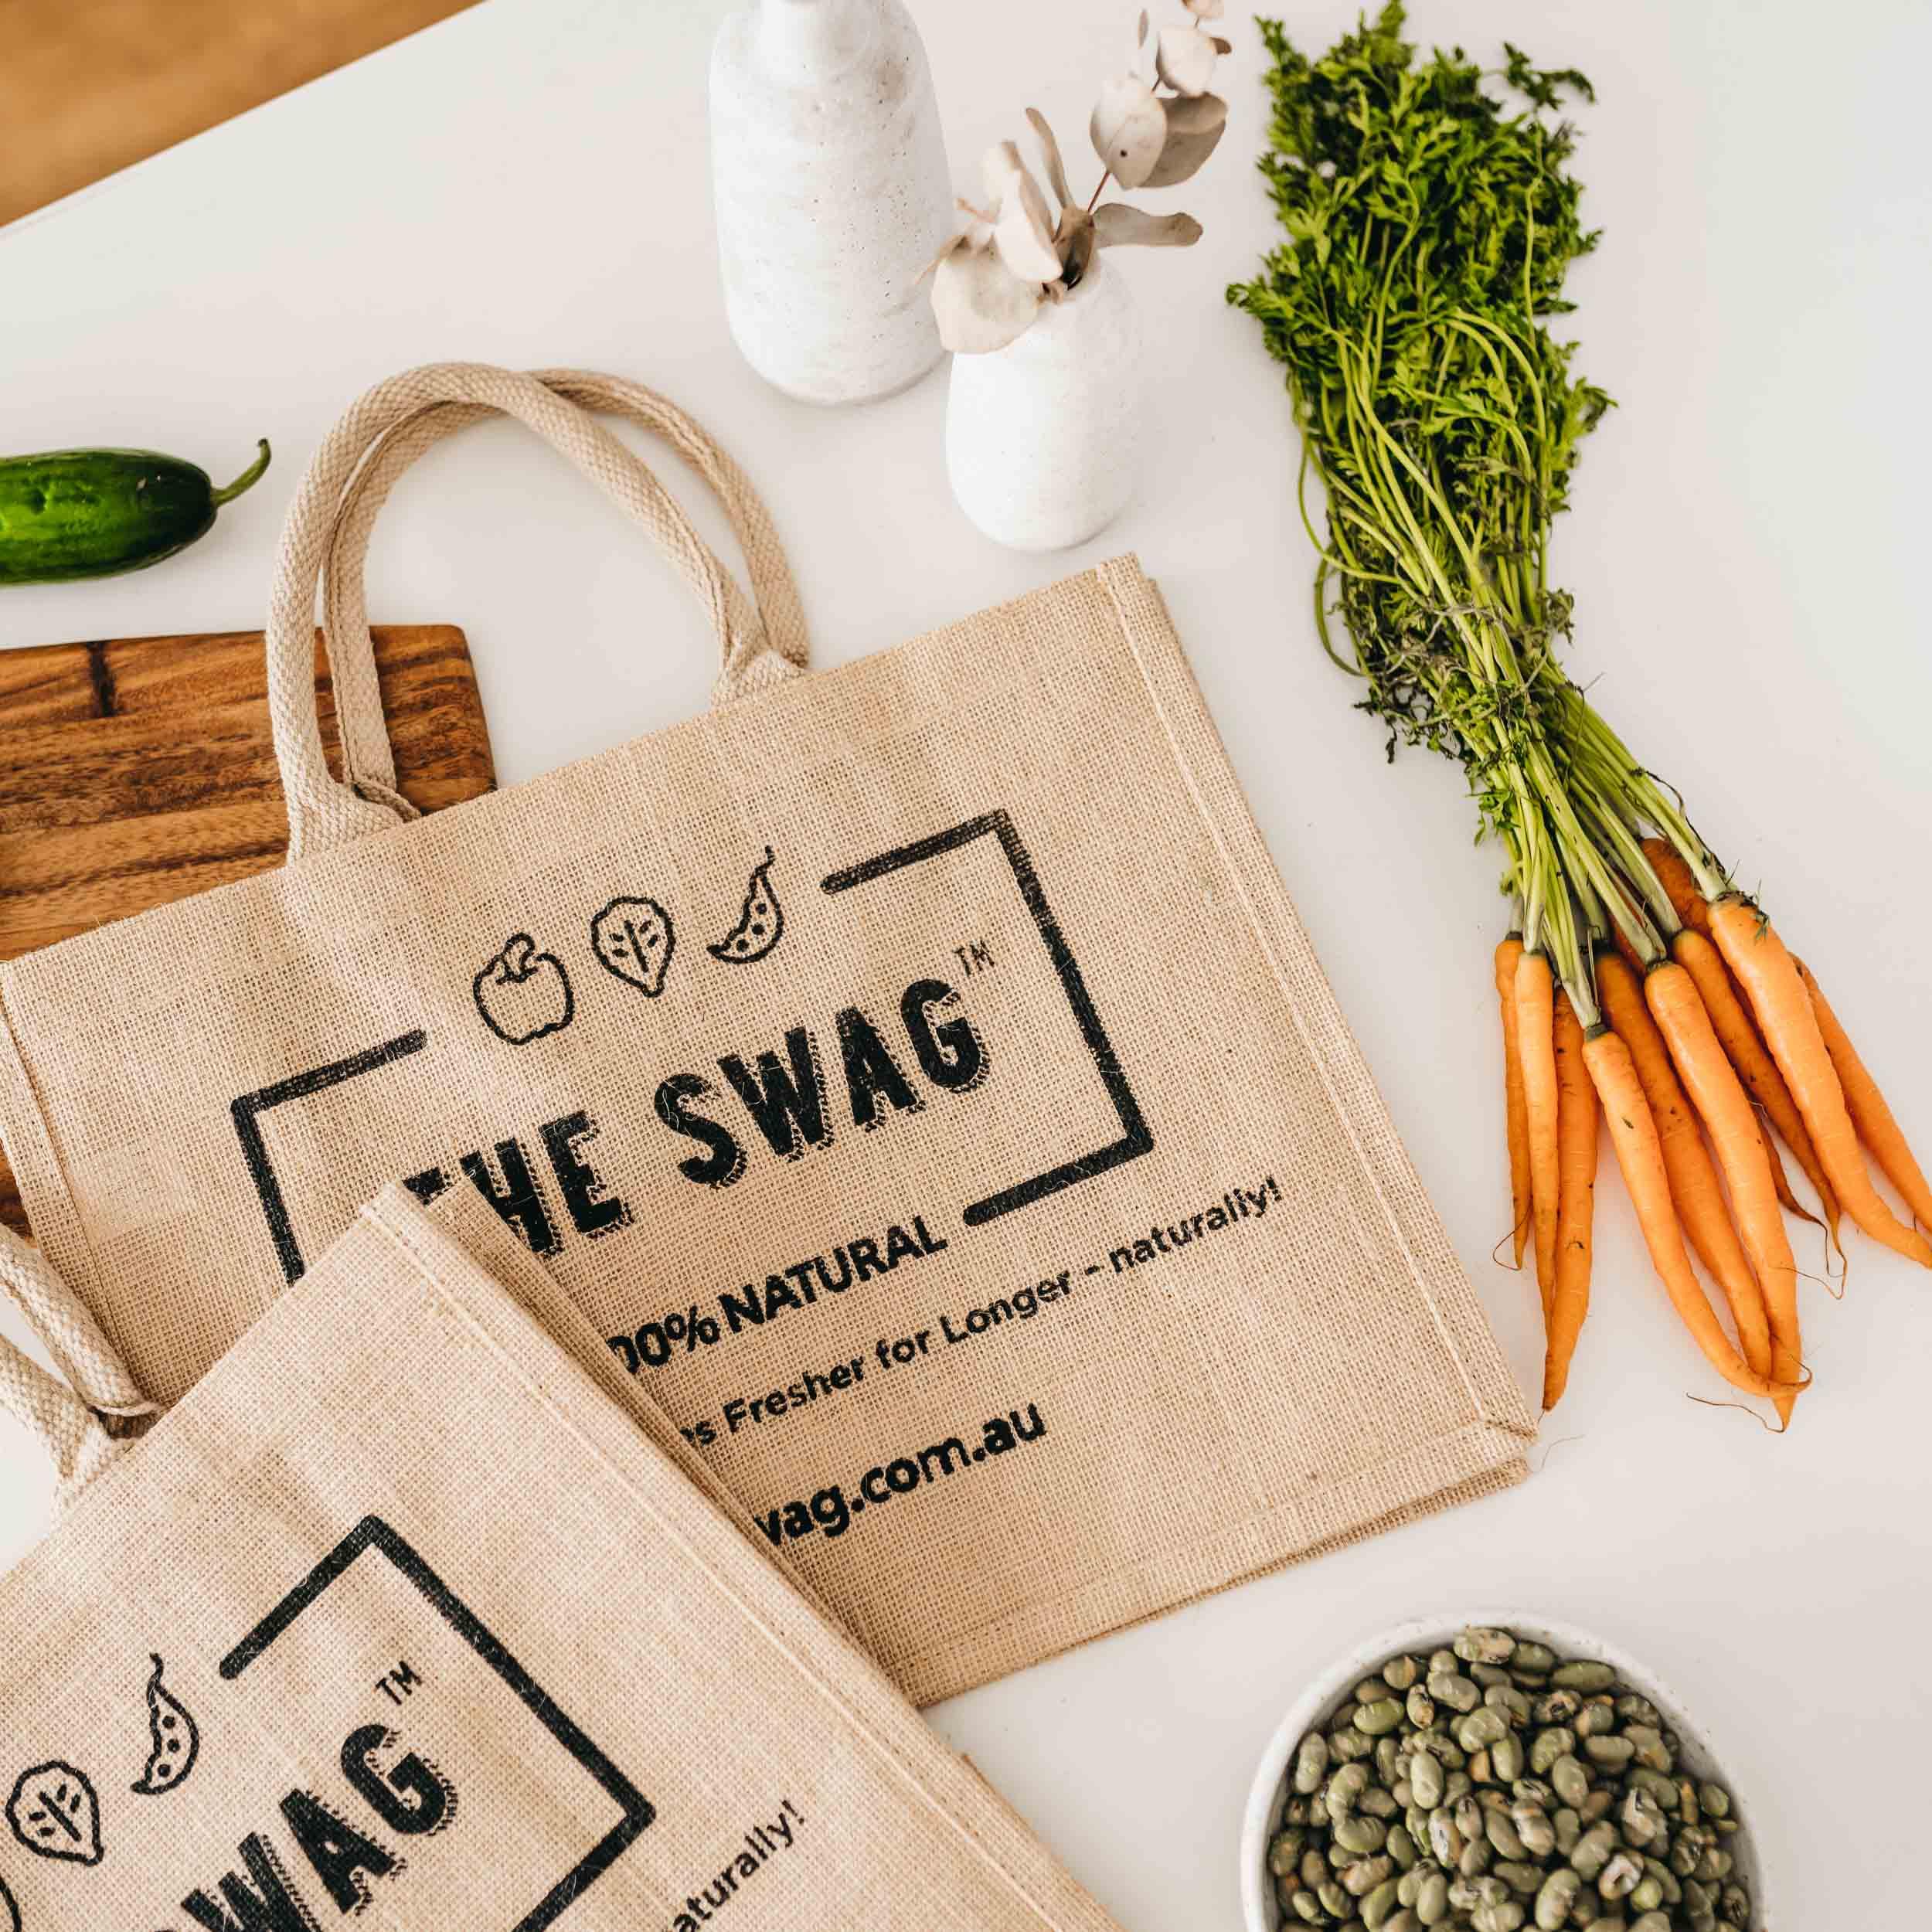 keira-mason-the-swag-bags-flatlay-details.jpg